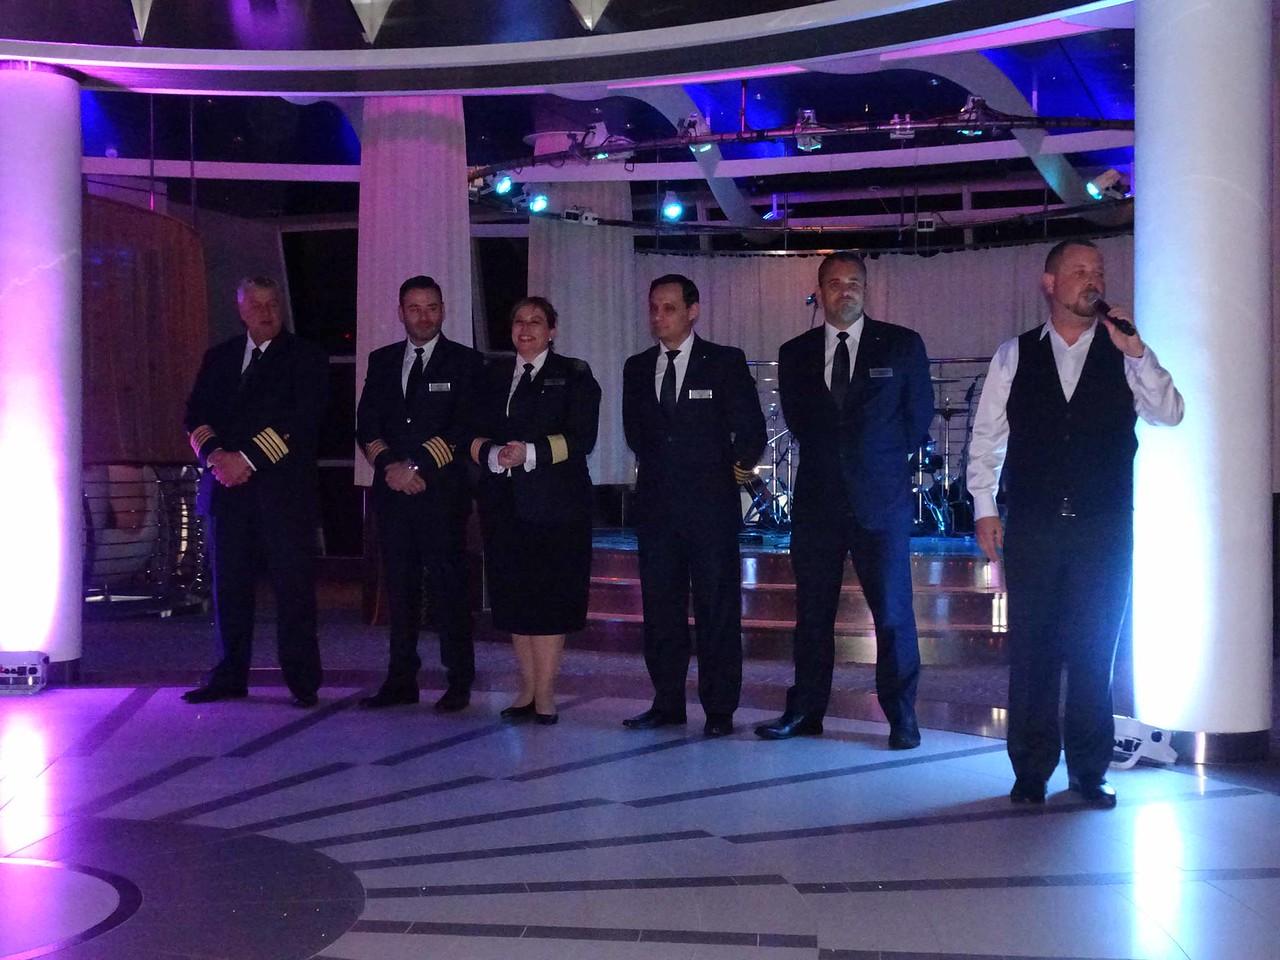 1020 The Senior Officers